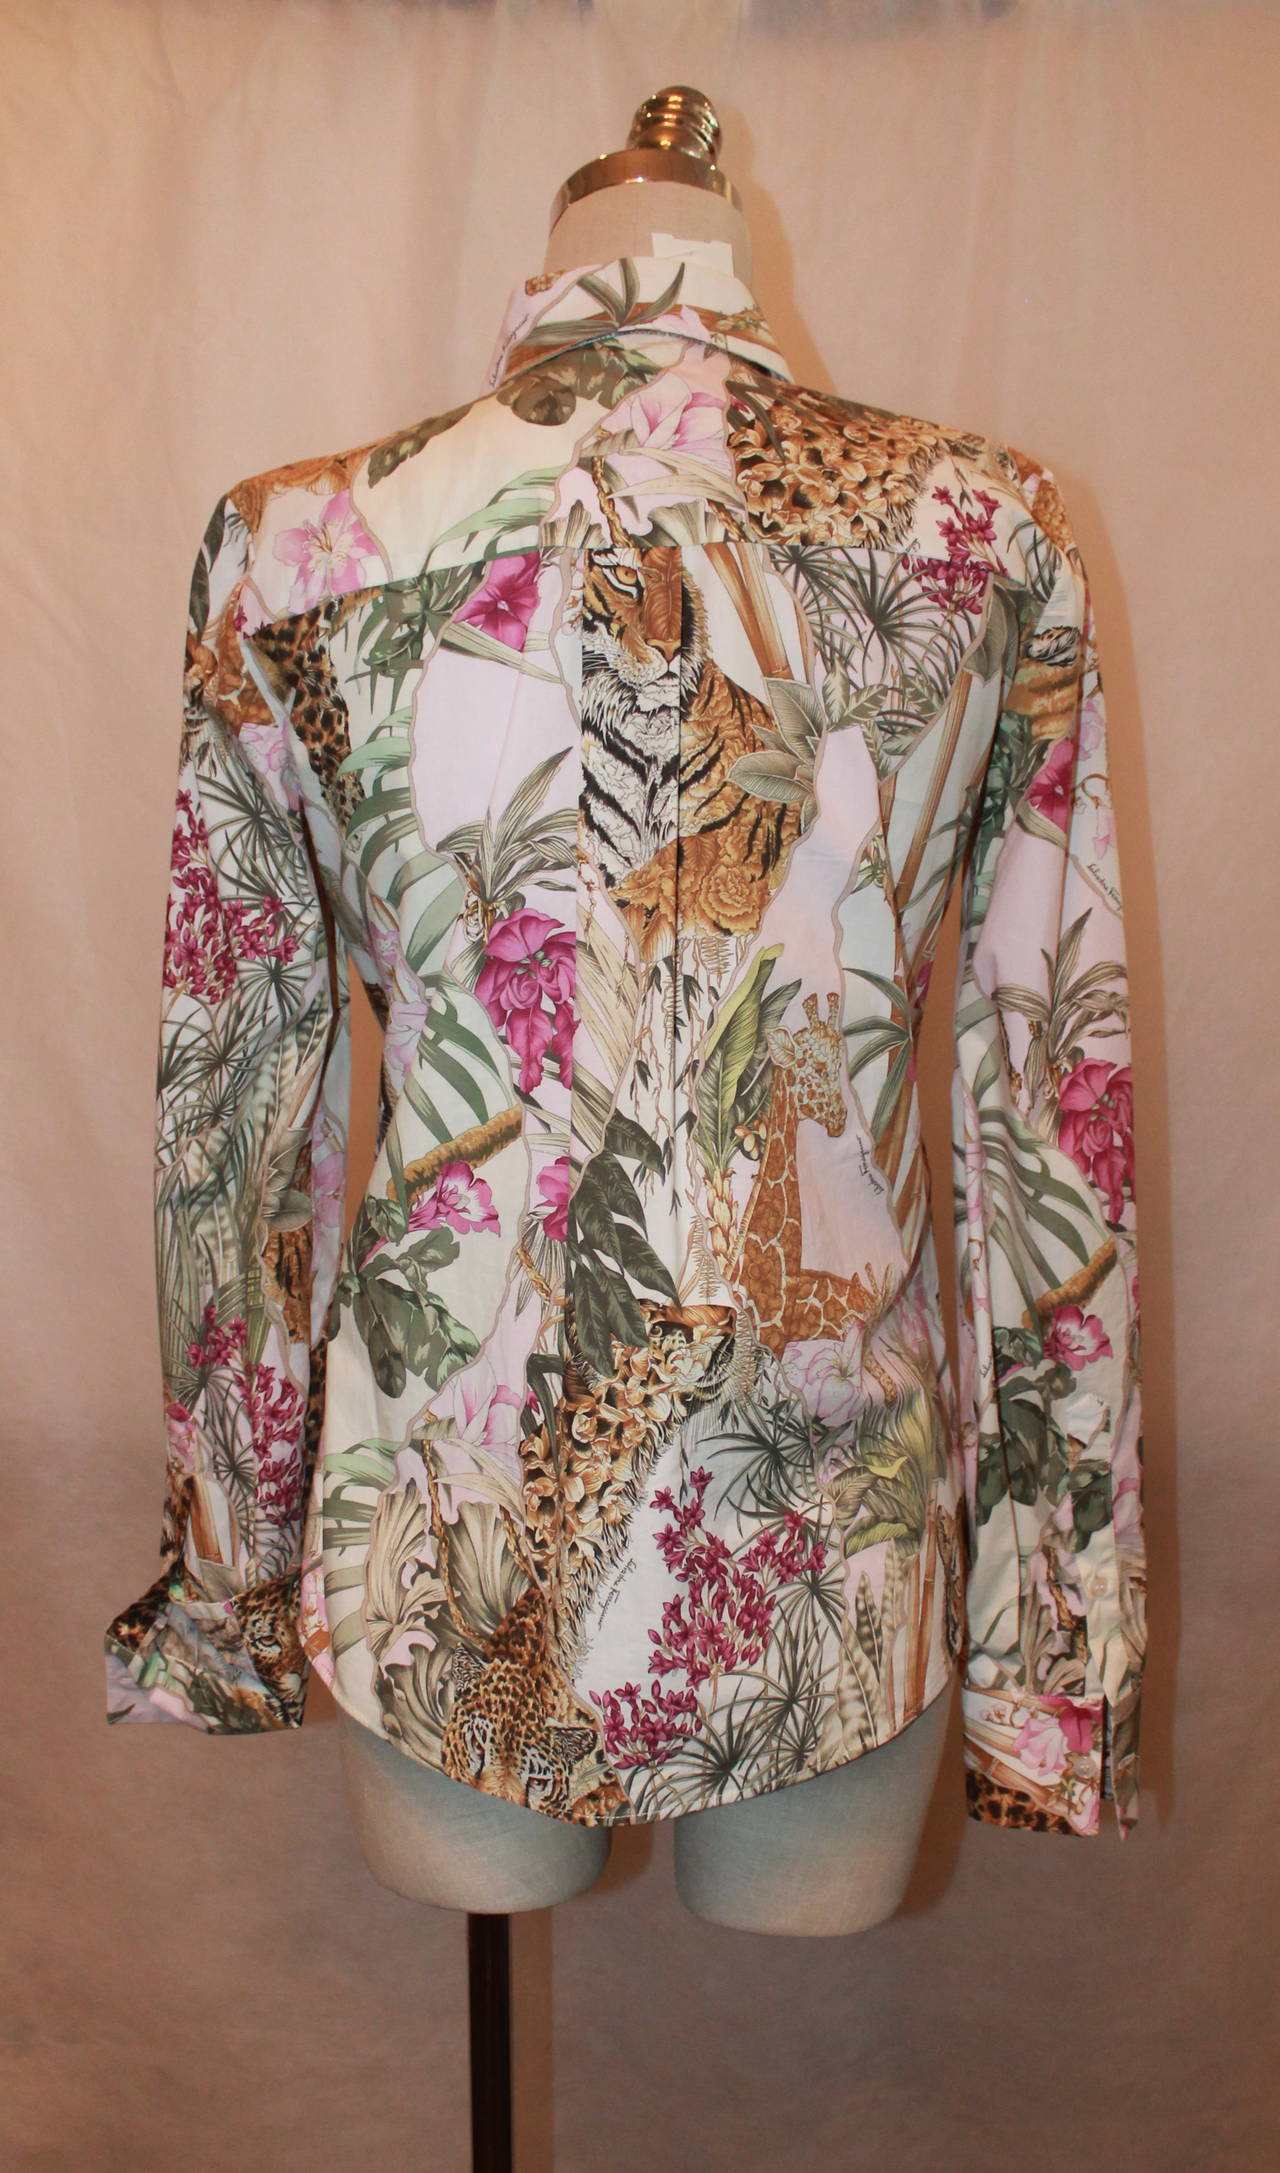 Salvatore Ferragamo Multi Color Jungle Print Long Sleeve Shirt - 40 4